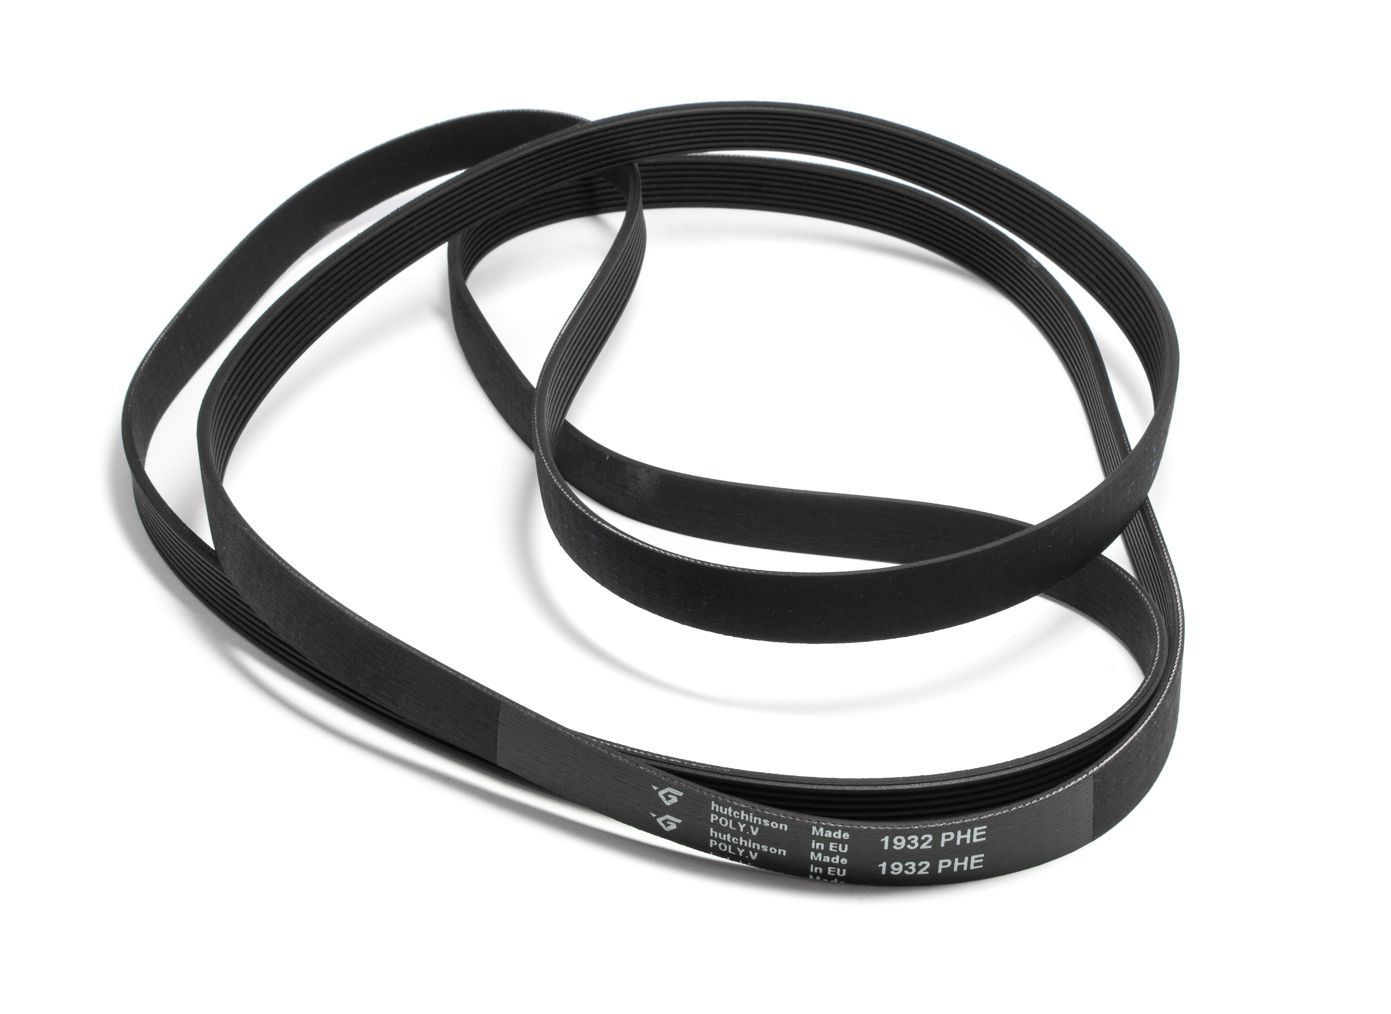 Belt for Indesit Ariston Tumble Dryers Whirlpool / Indesit